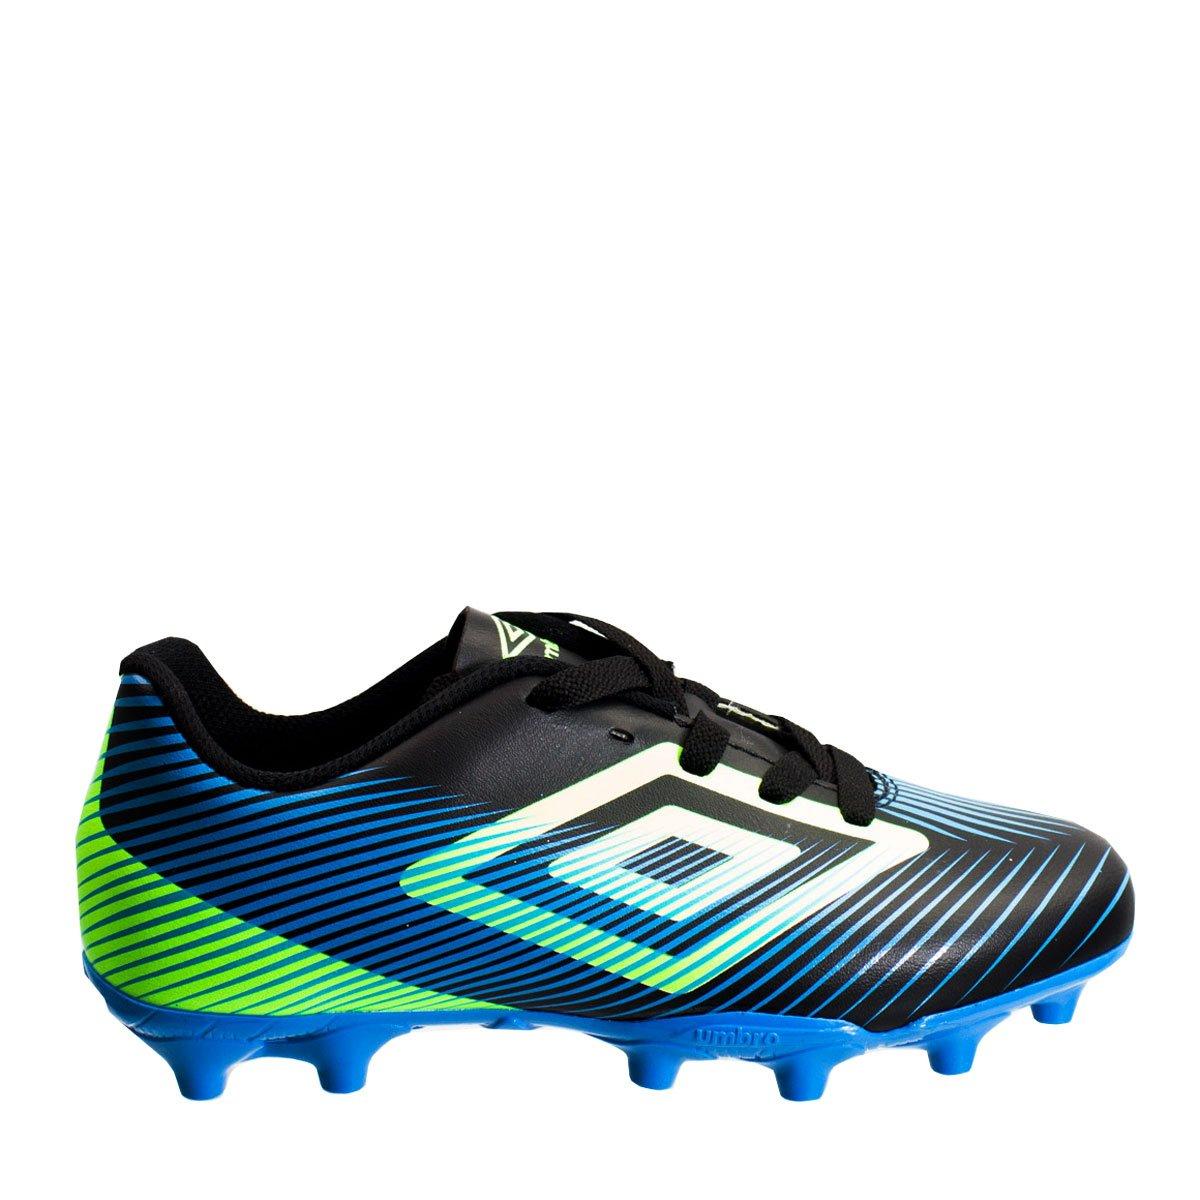 3a41fb17a6 Bizz Store - Chuteira Infantil Futebol de Campo Umbro Speed II JR